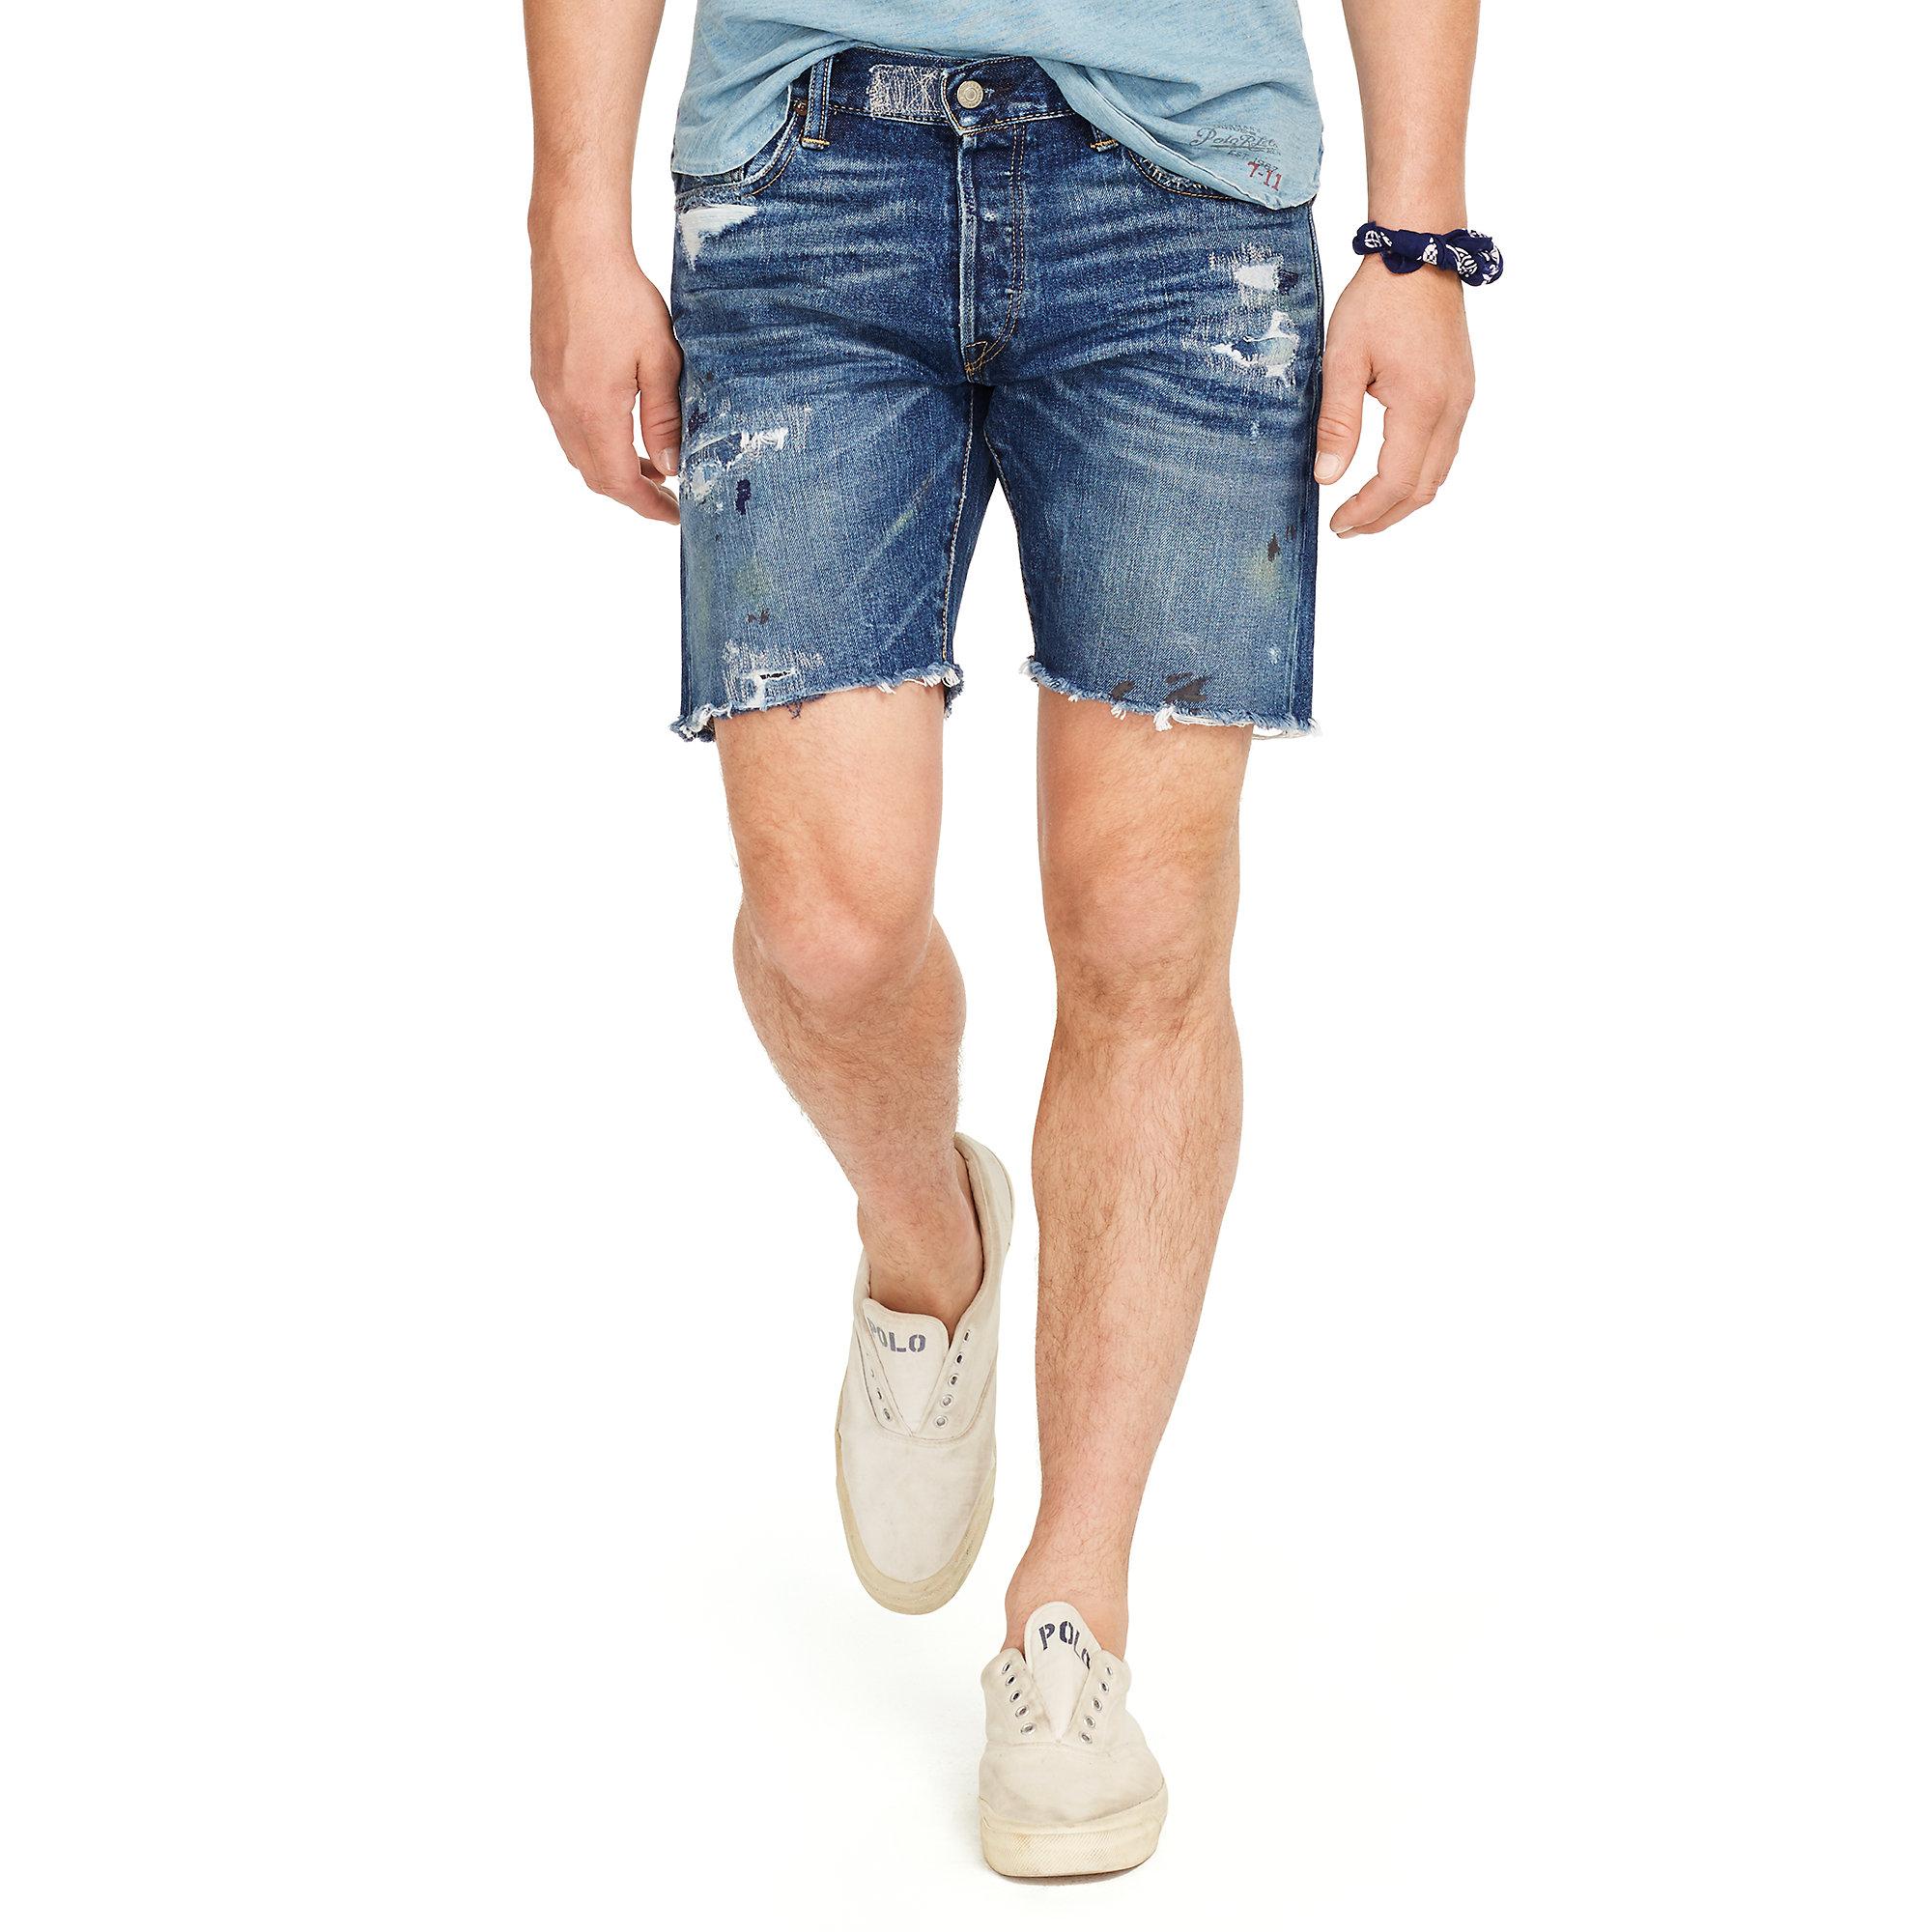 polo jean shorts